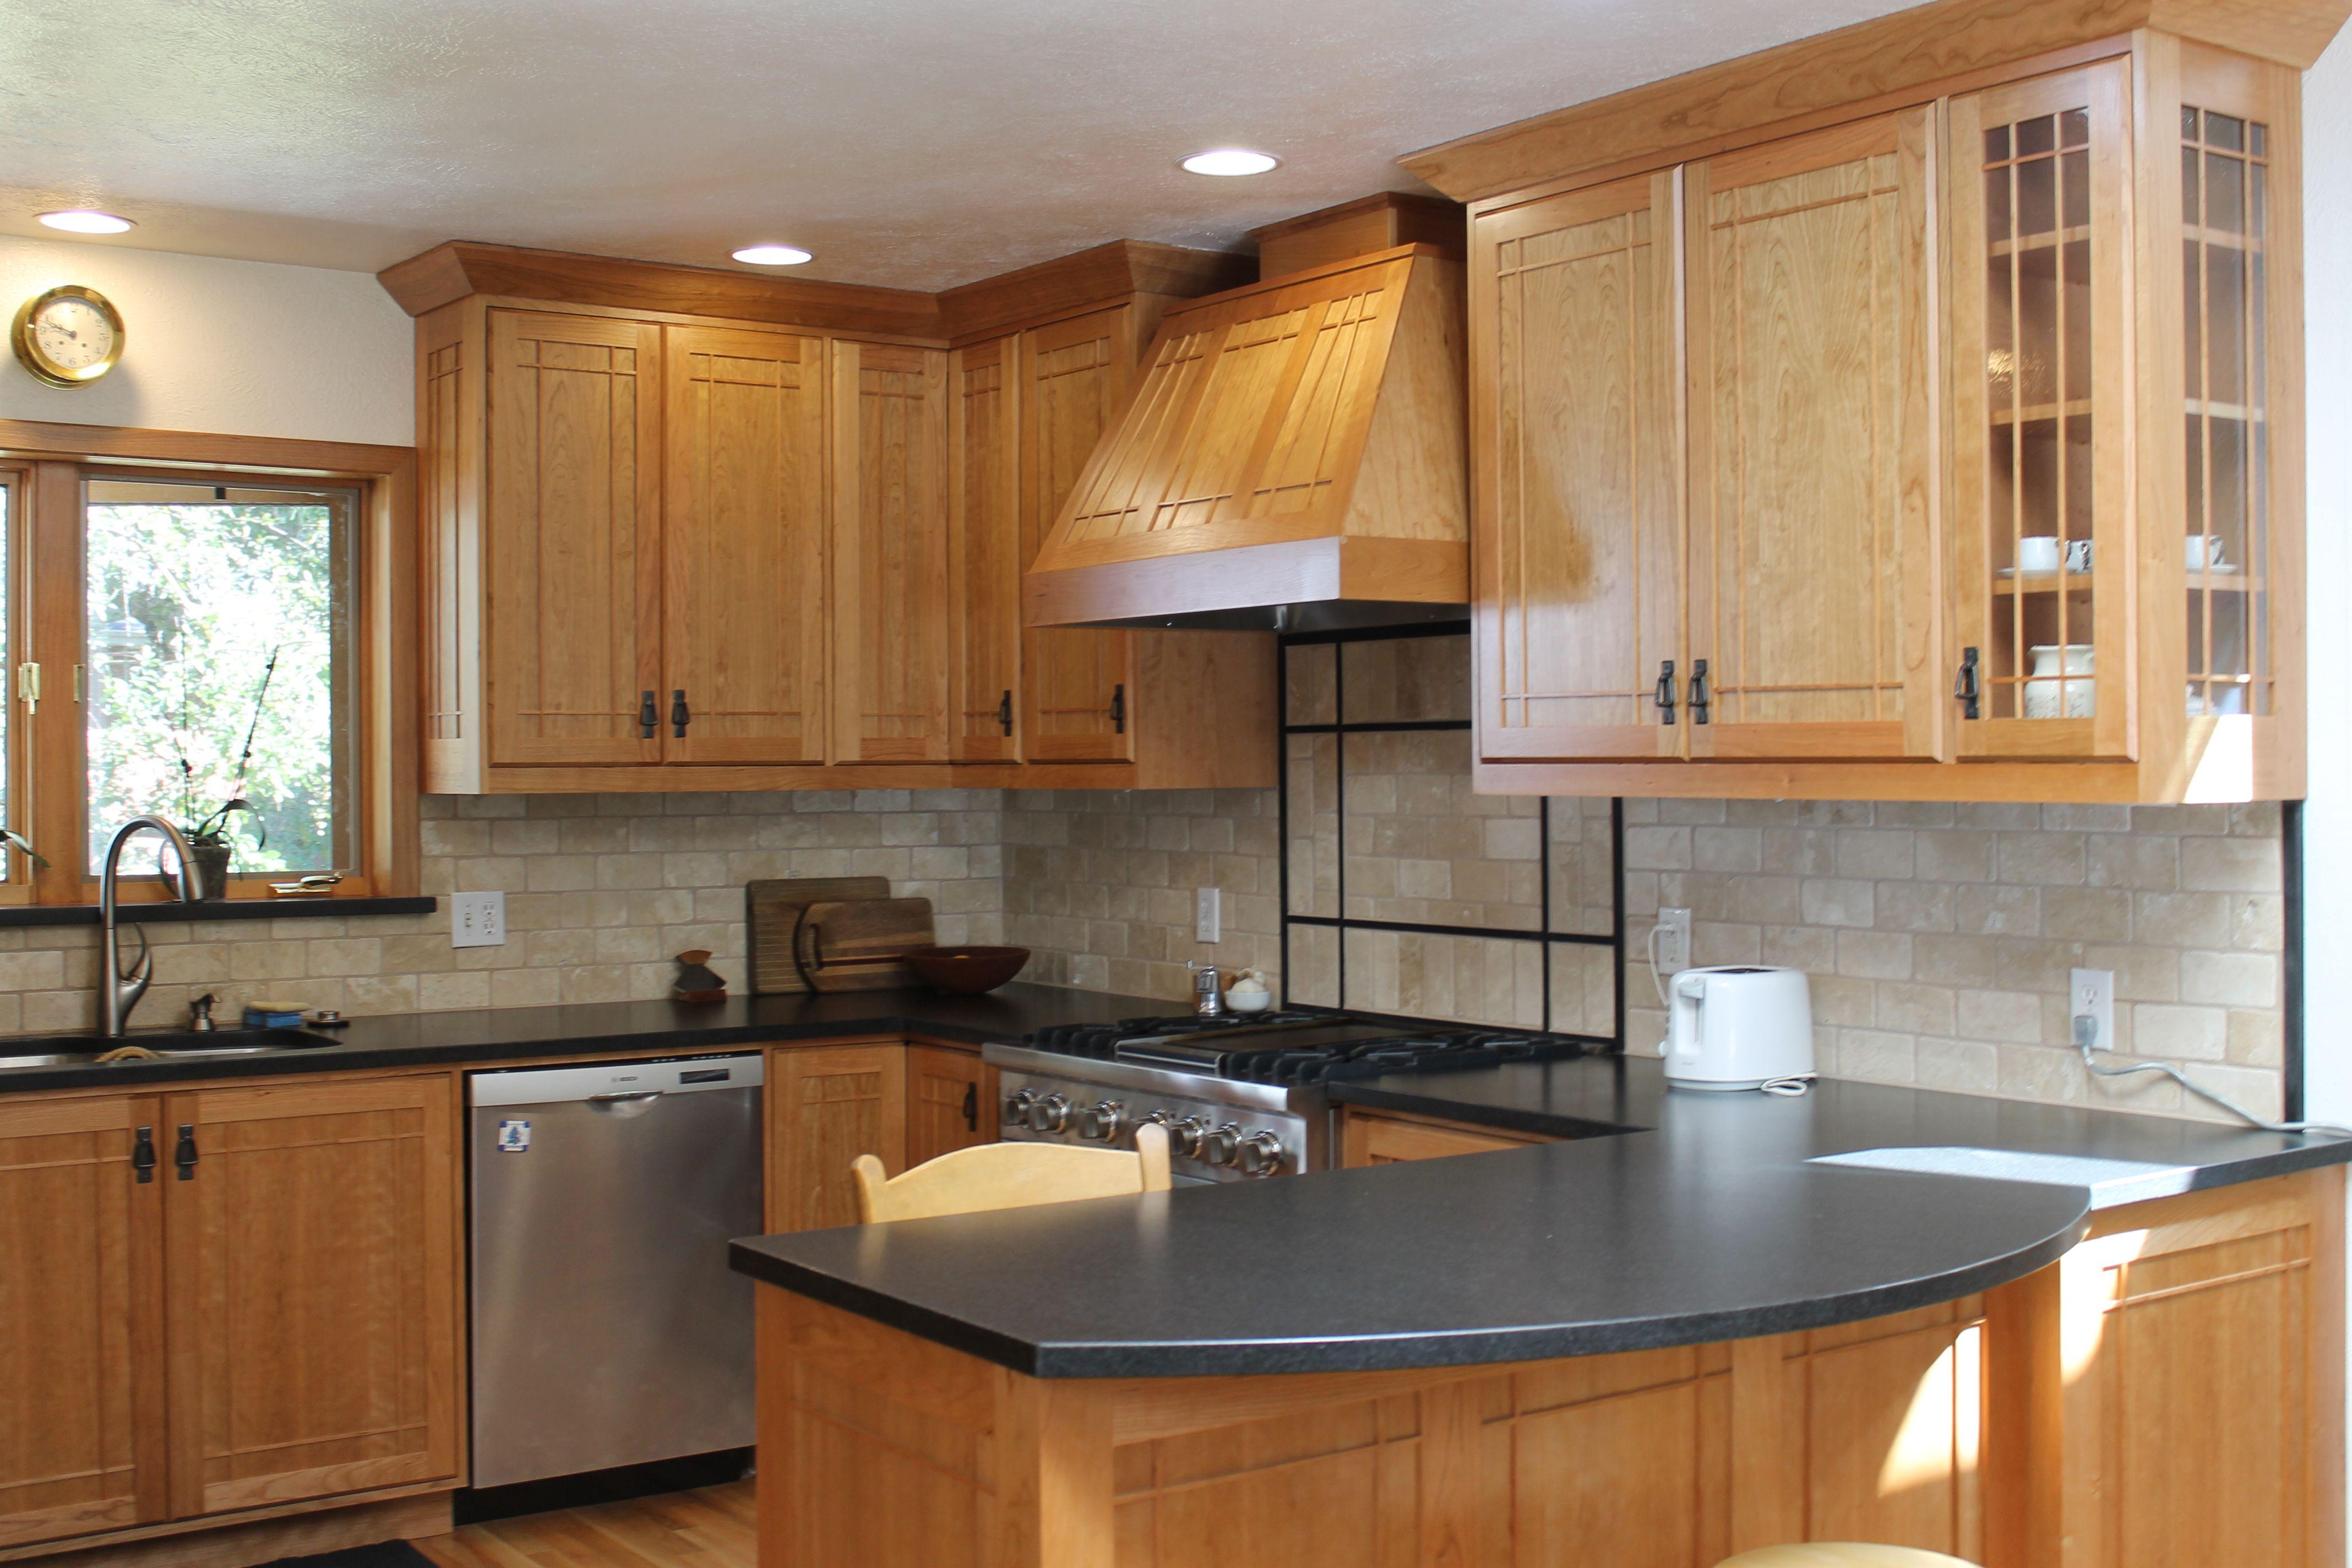 interior traditional kitchen design with oak wood cabinetstogo and black granite rustic on kitchen cabinets design id=53968